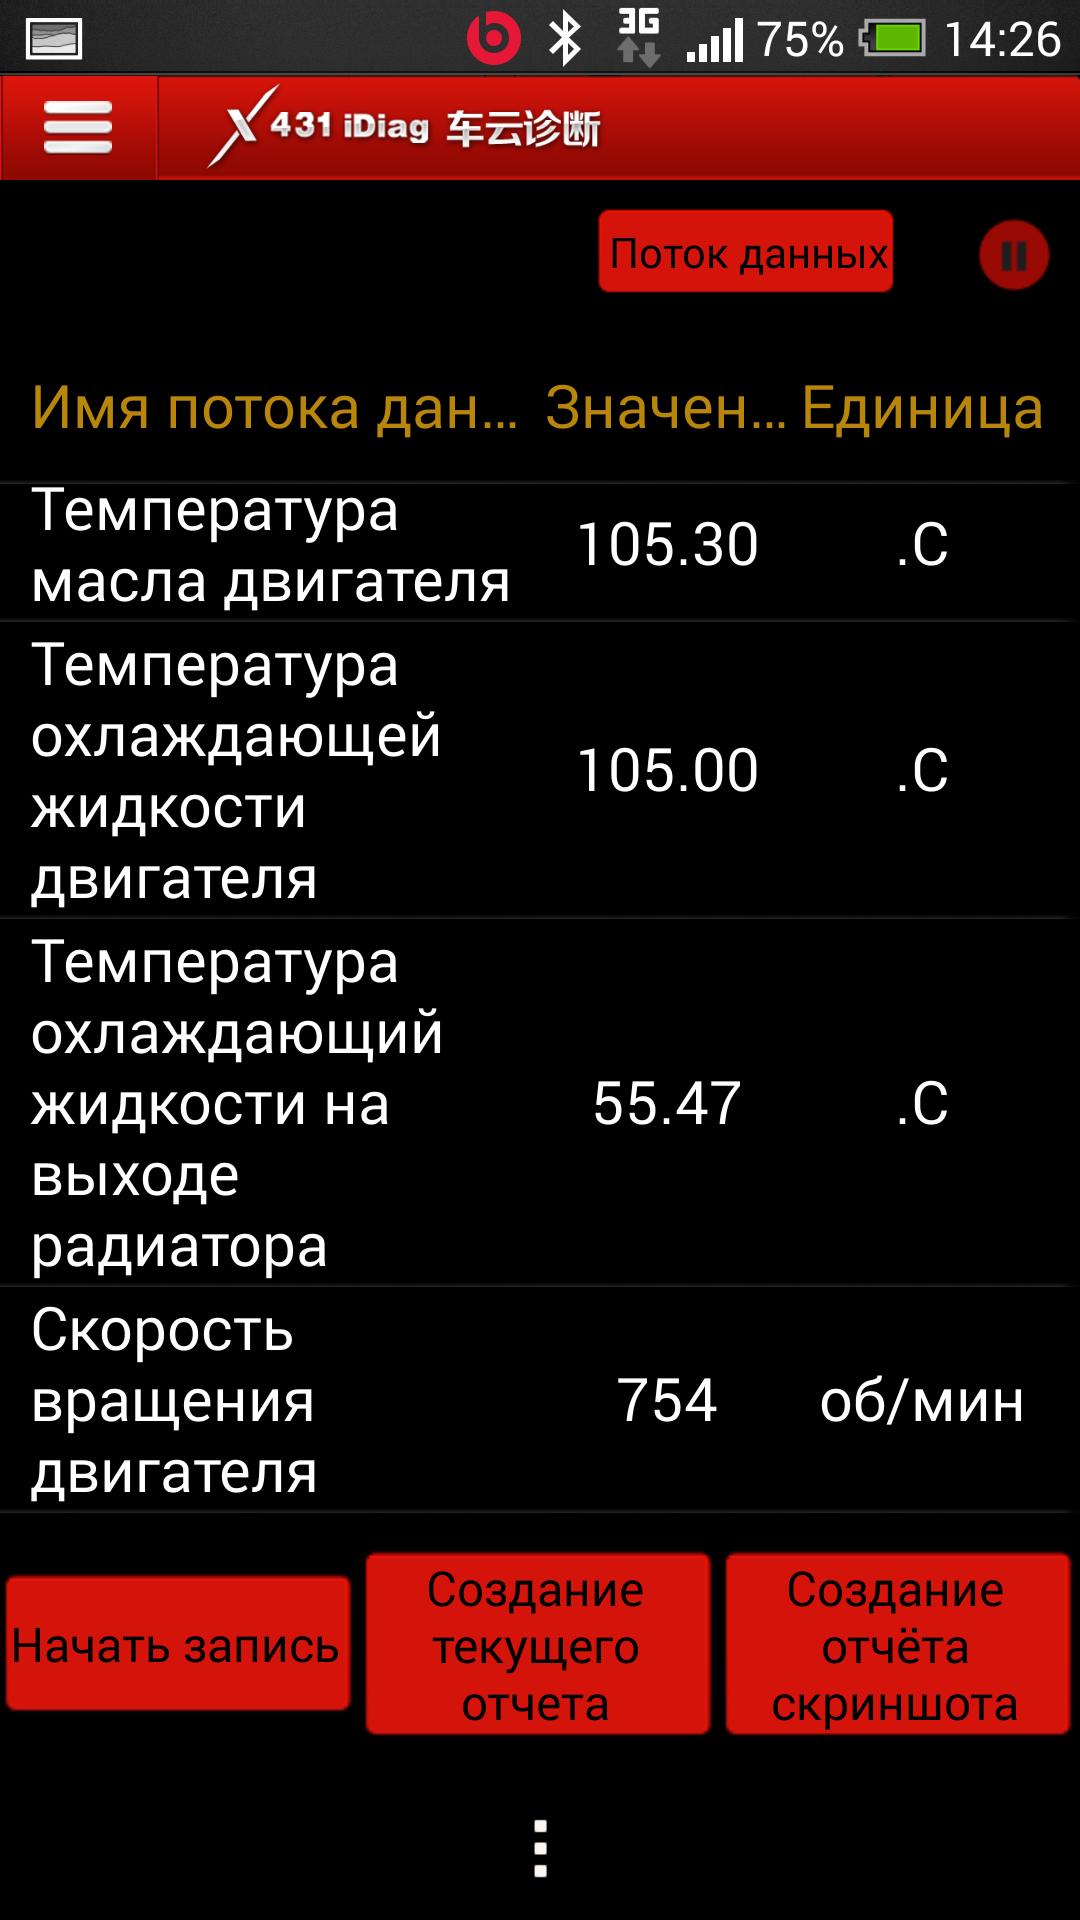 Screenshot_2021-01-21-14-26-12